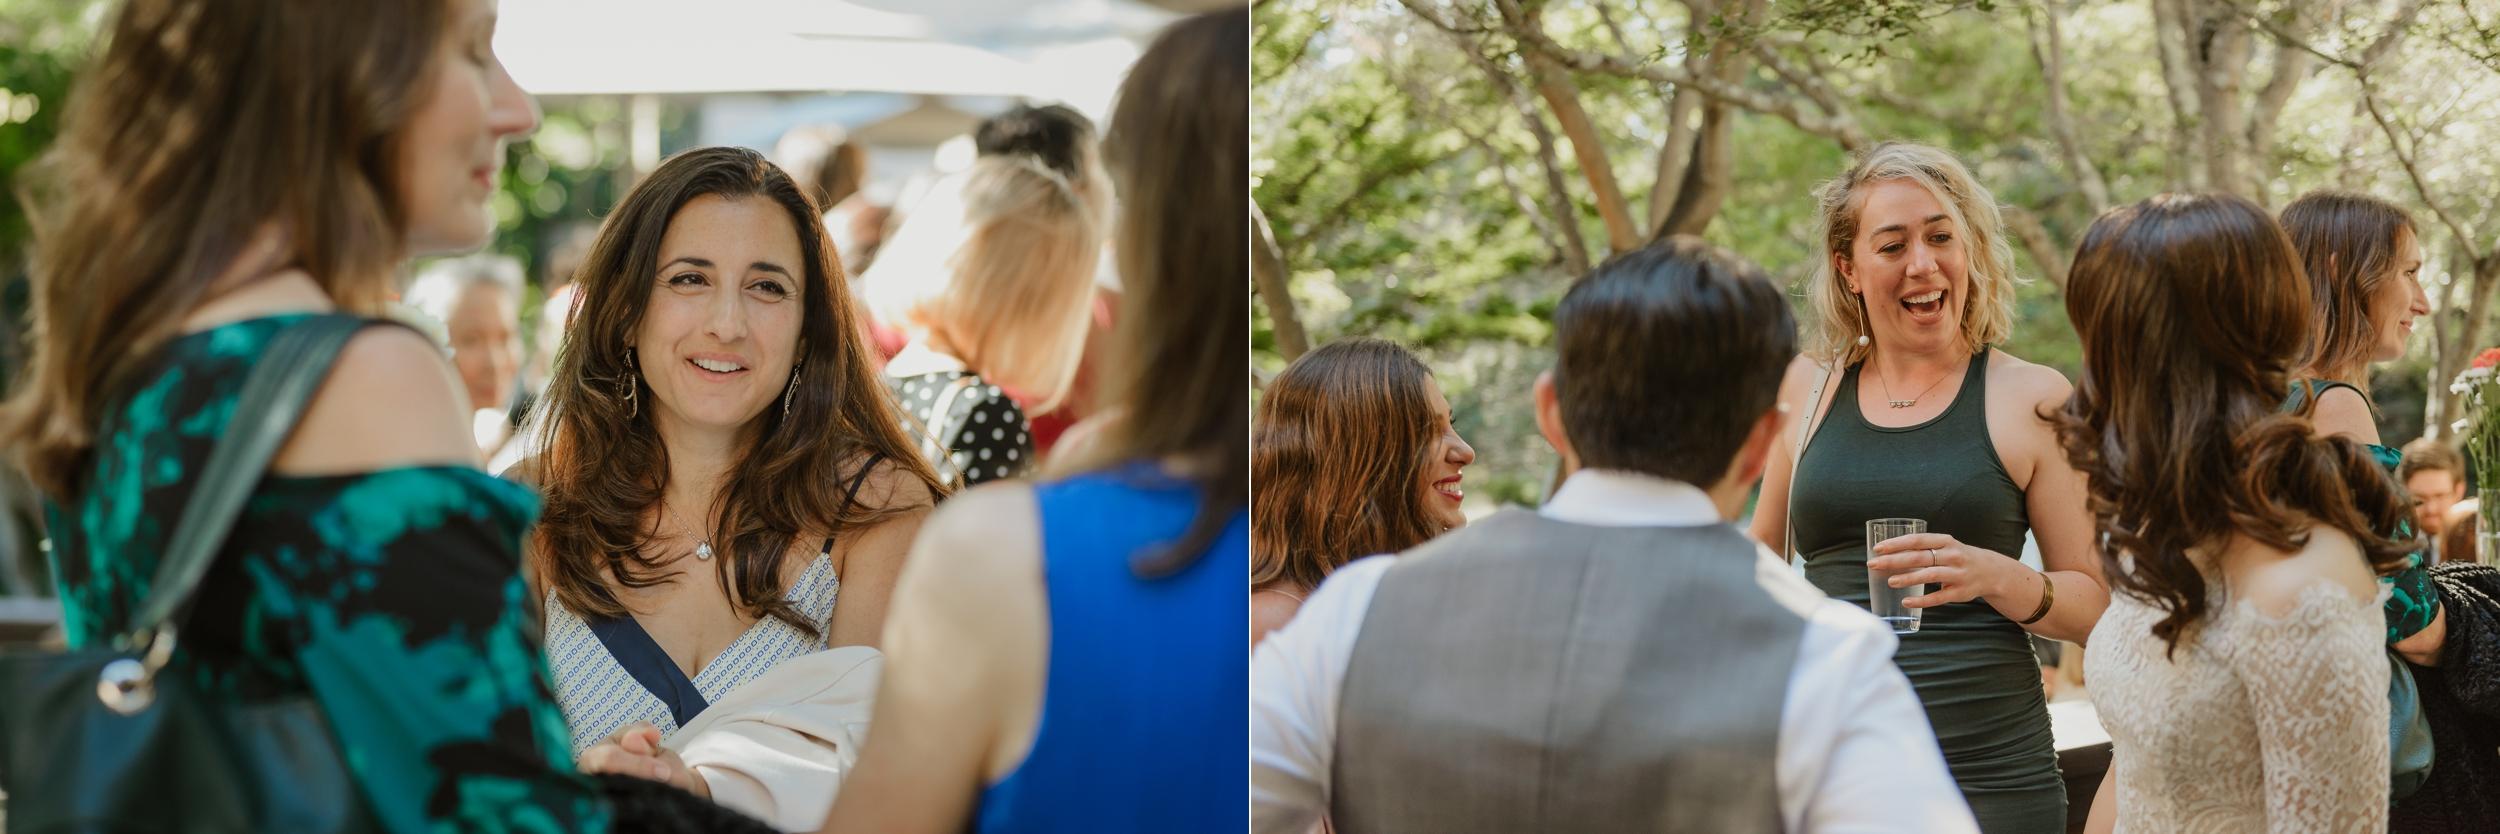 44-berkeley-uc-faculty-club-wedding-kb-vivianchen-302_WEB.jpg